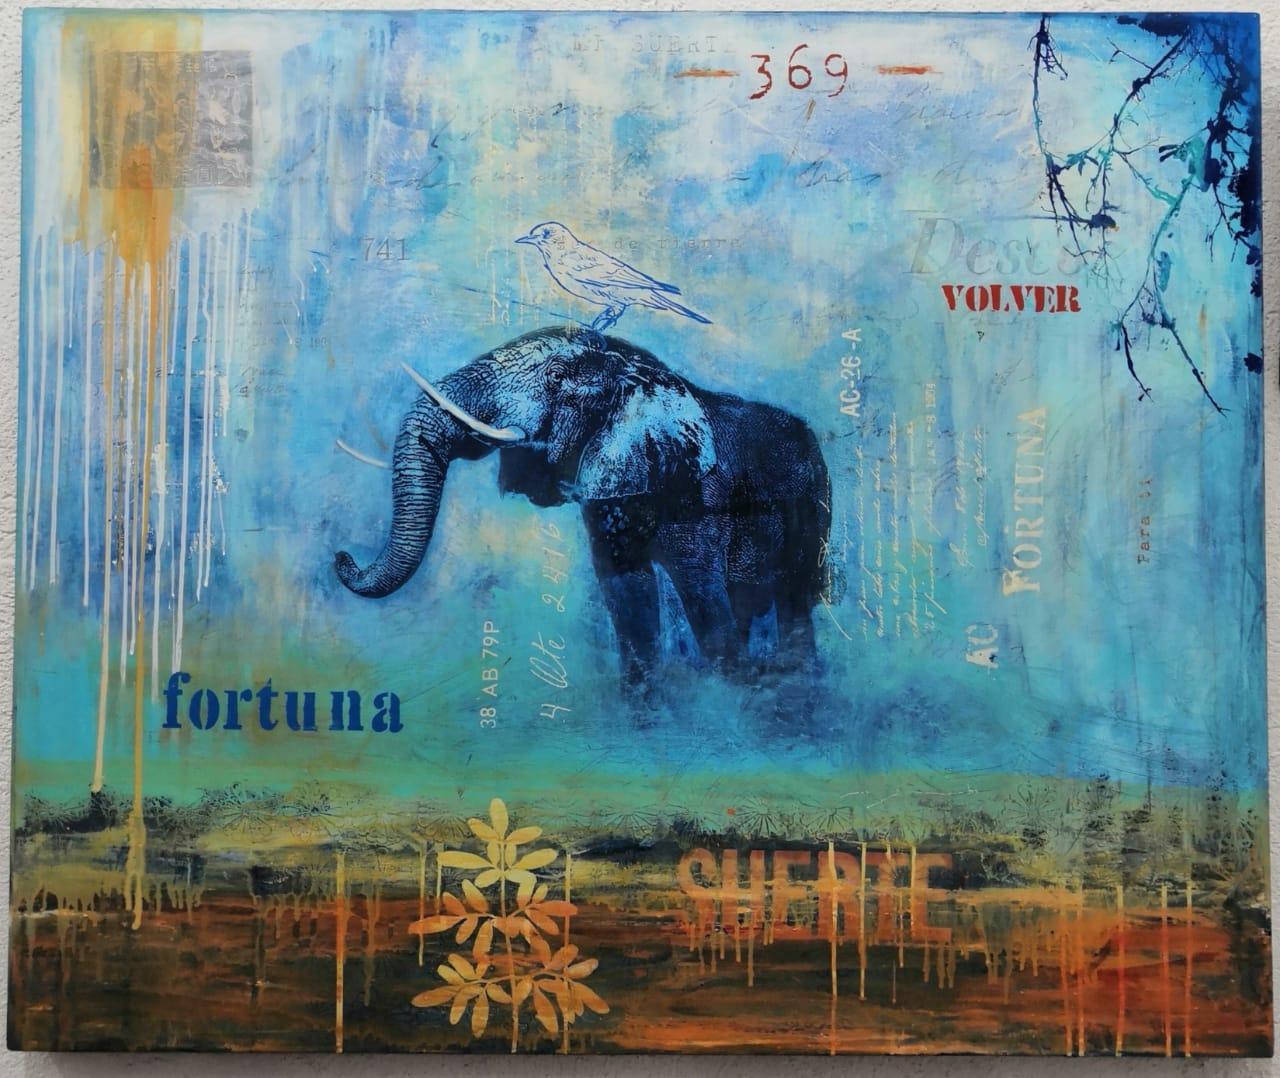 Fortuna, Sin Galeria, Ana Santos